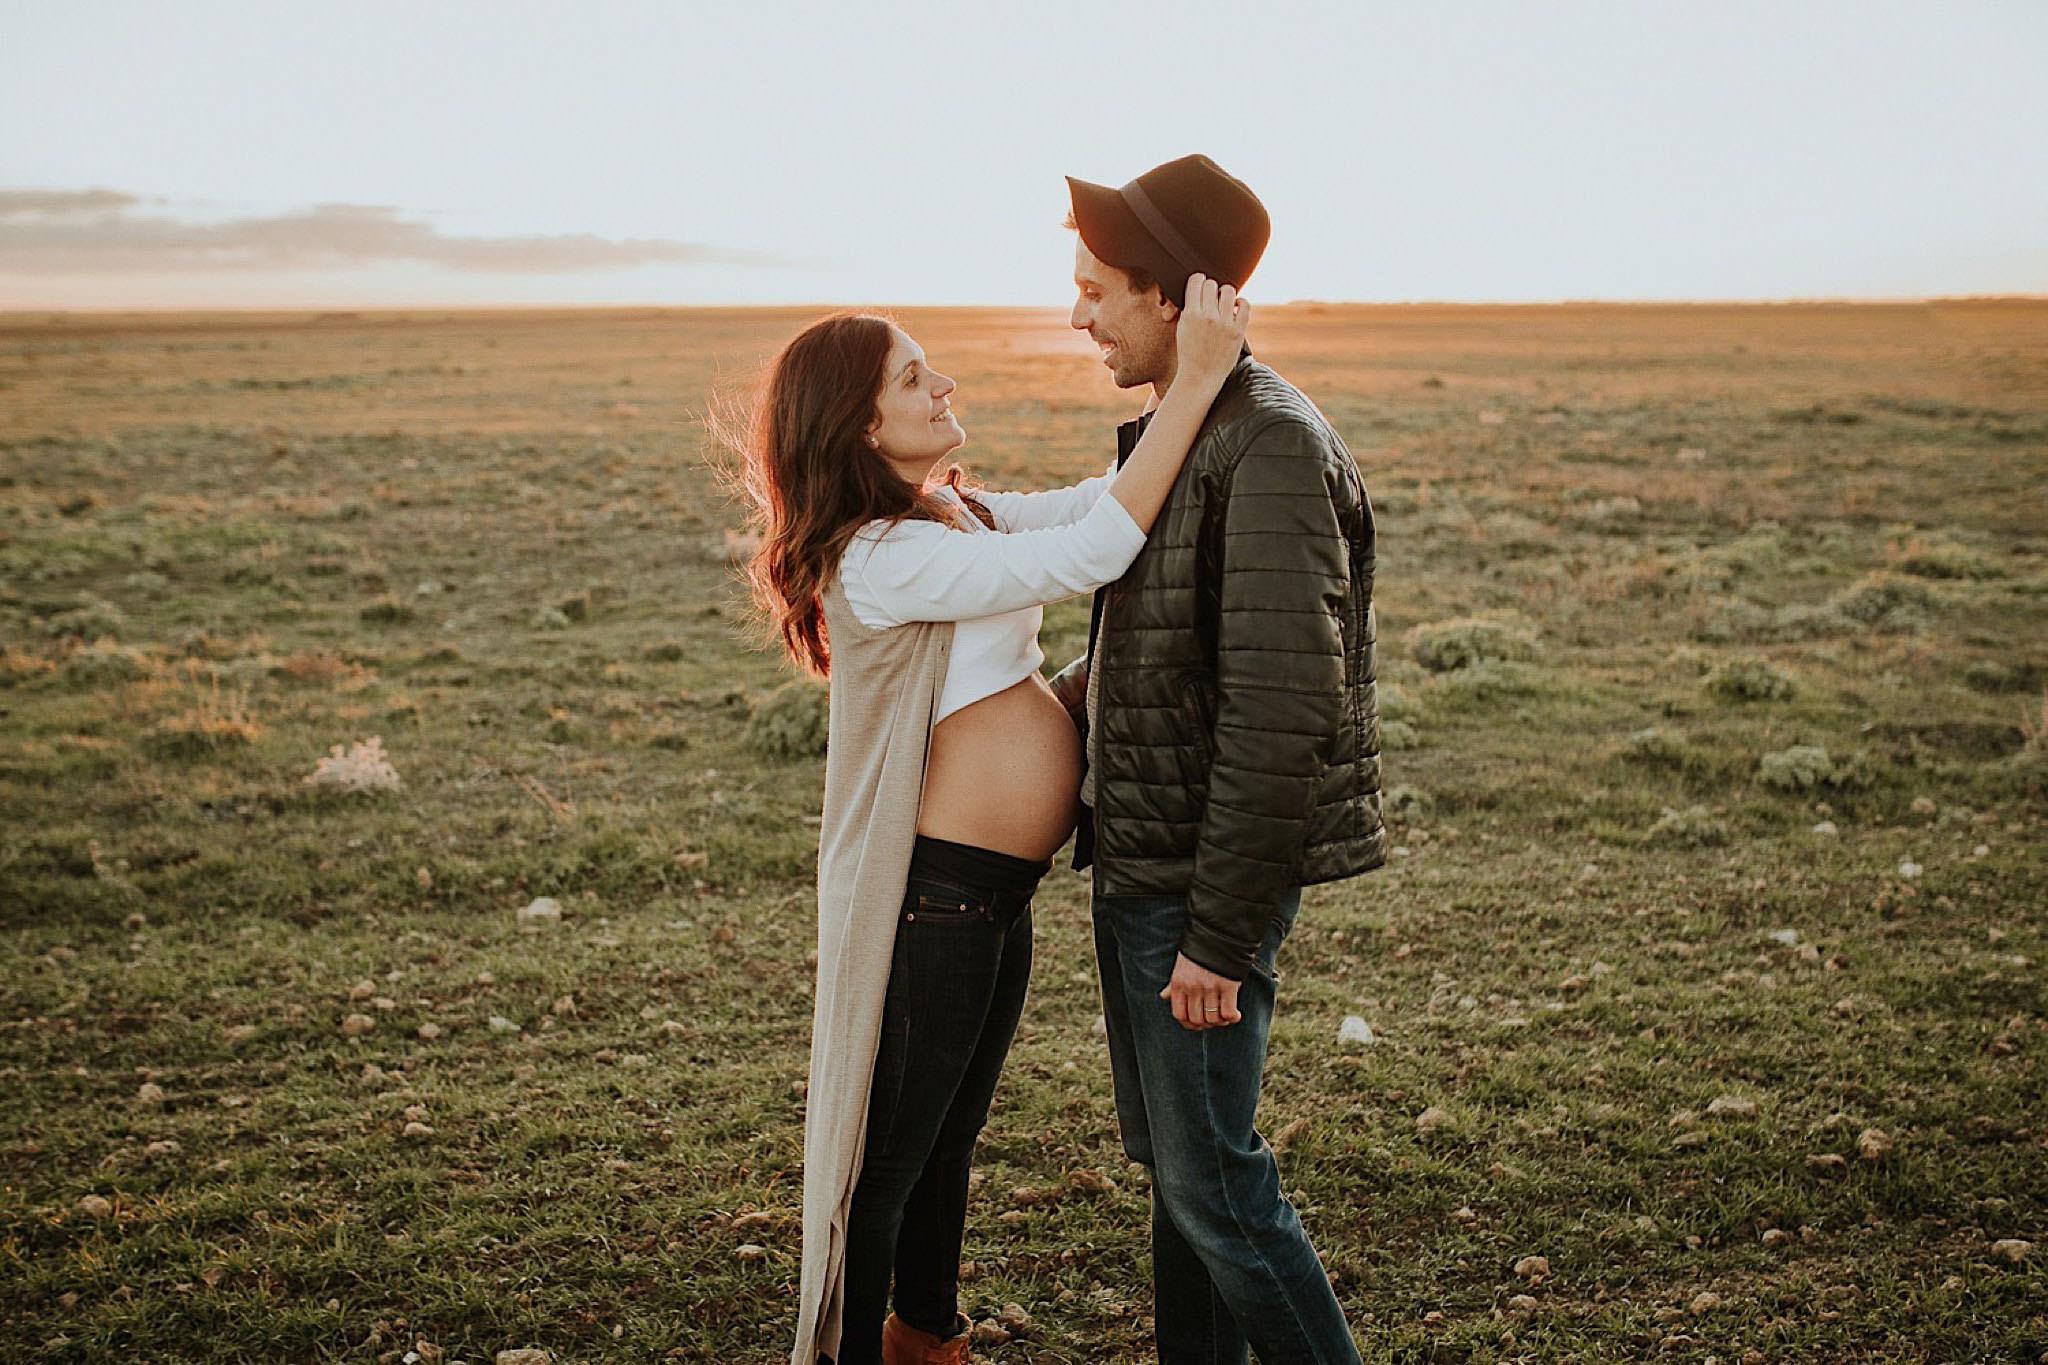 reportaje de fotos embarazo